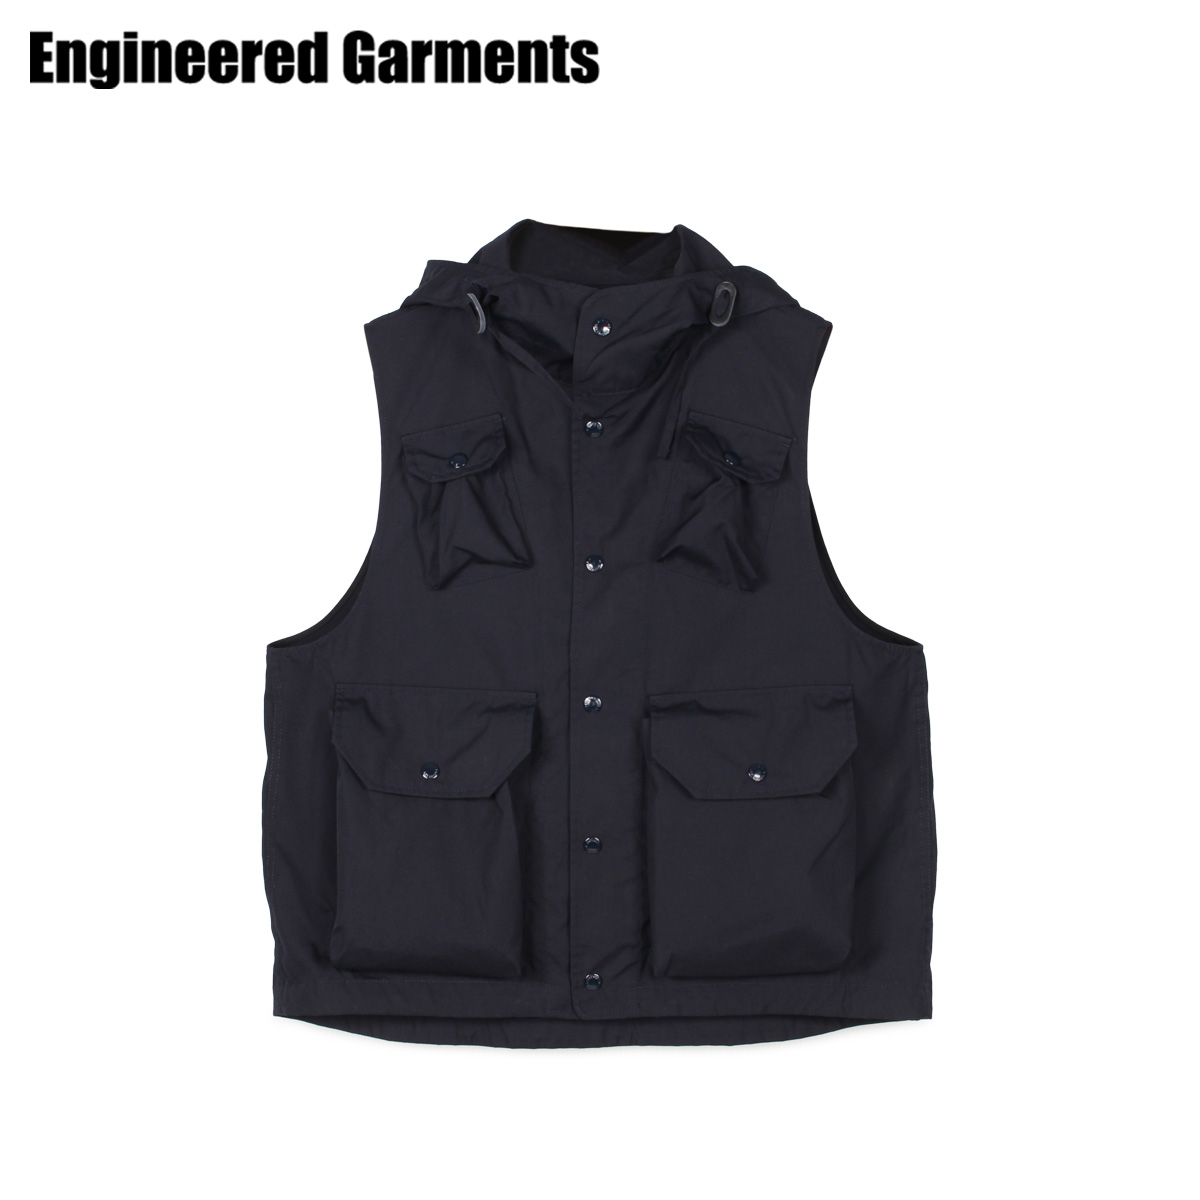 ENGINEERED GARMENTS エンジニアドガーメンツ ベスト ジレ メンズ FIELD VEST ネイビー 20S1C004